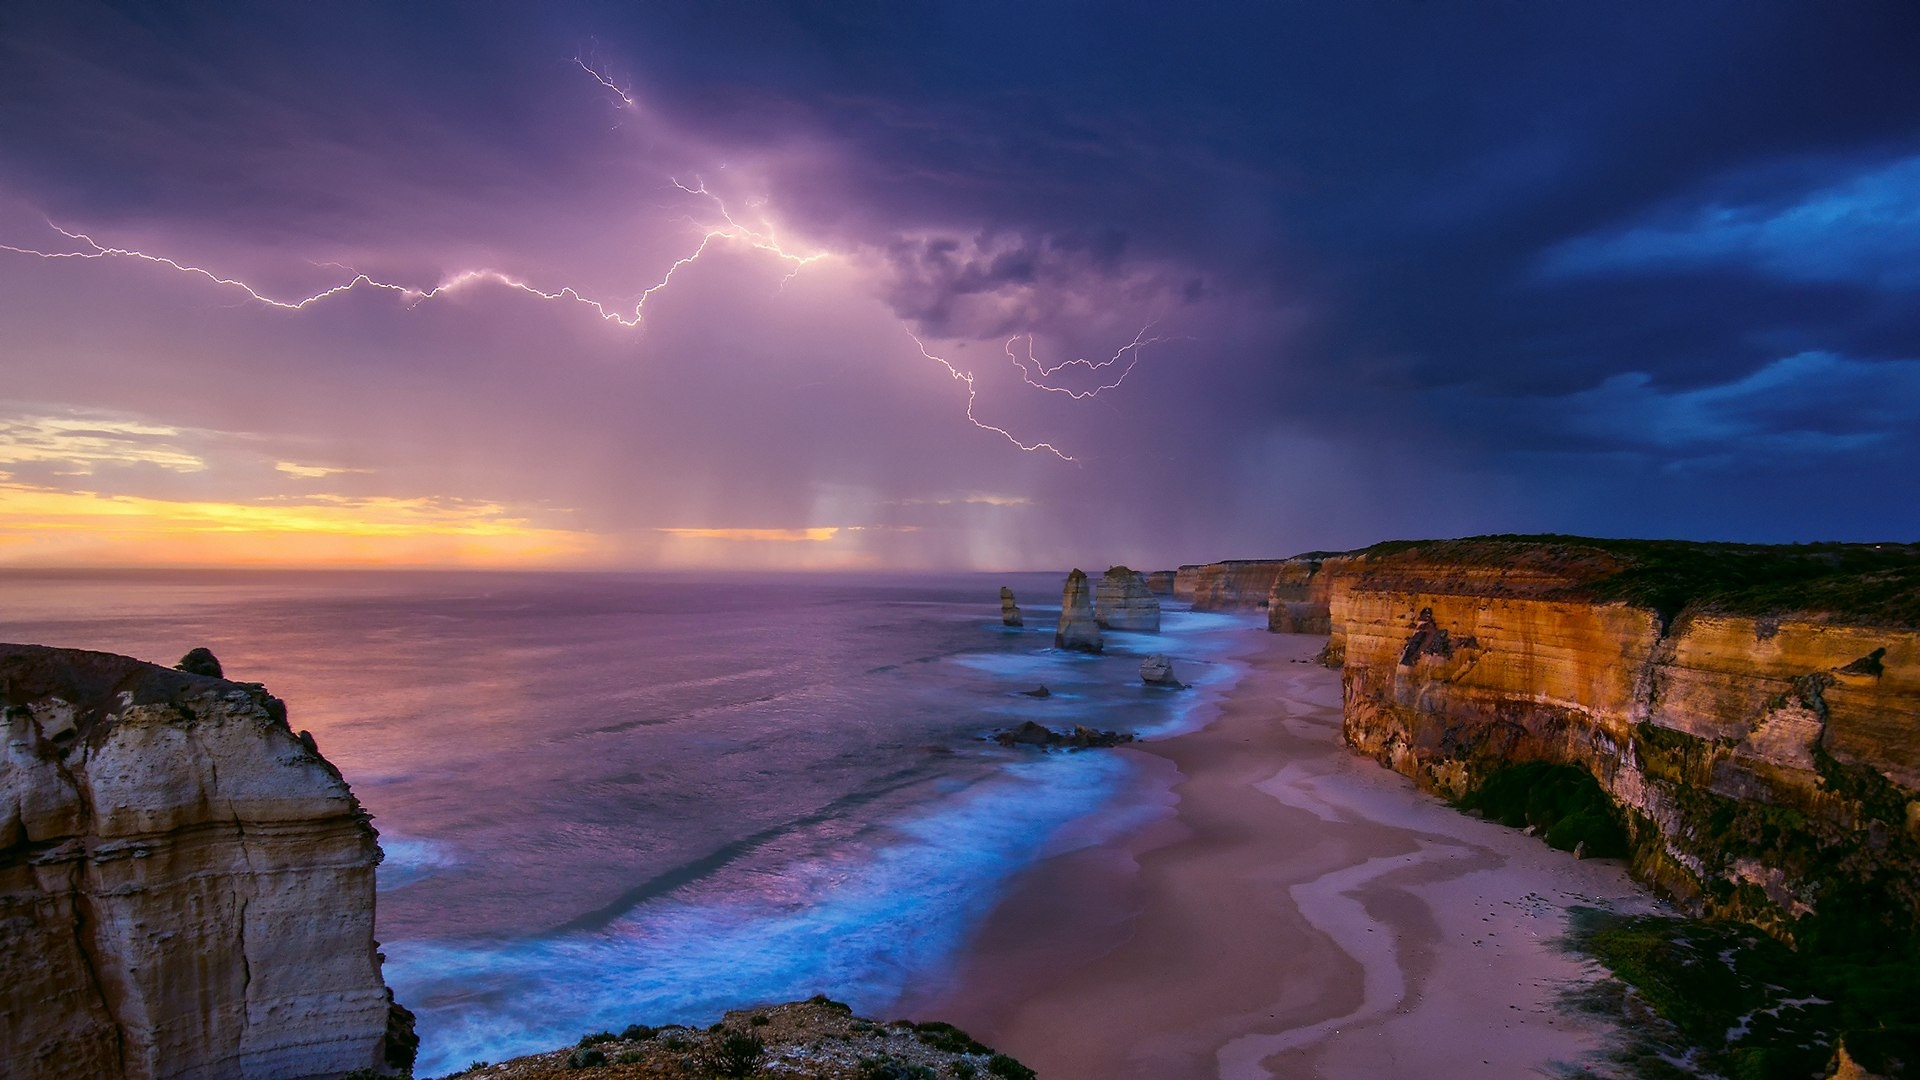 Lightning above the The Twelve Apostles (Australia) wallpaper